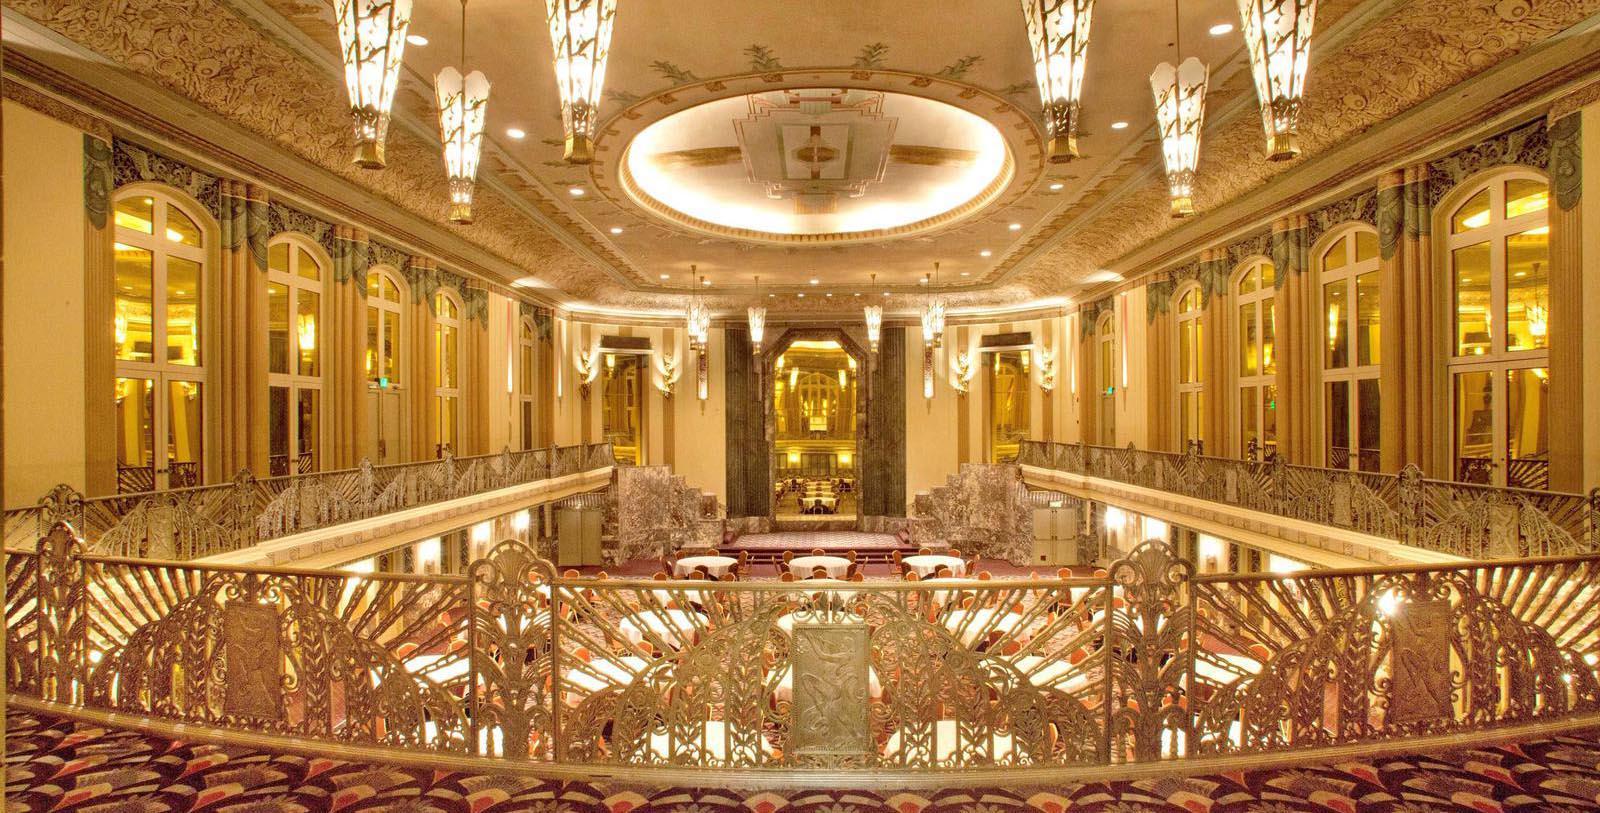 Image of Hall of Mirrors at the Hilton Cincinnati Netherland Plaza in Ohio.